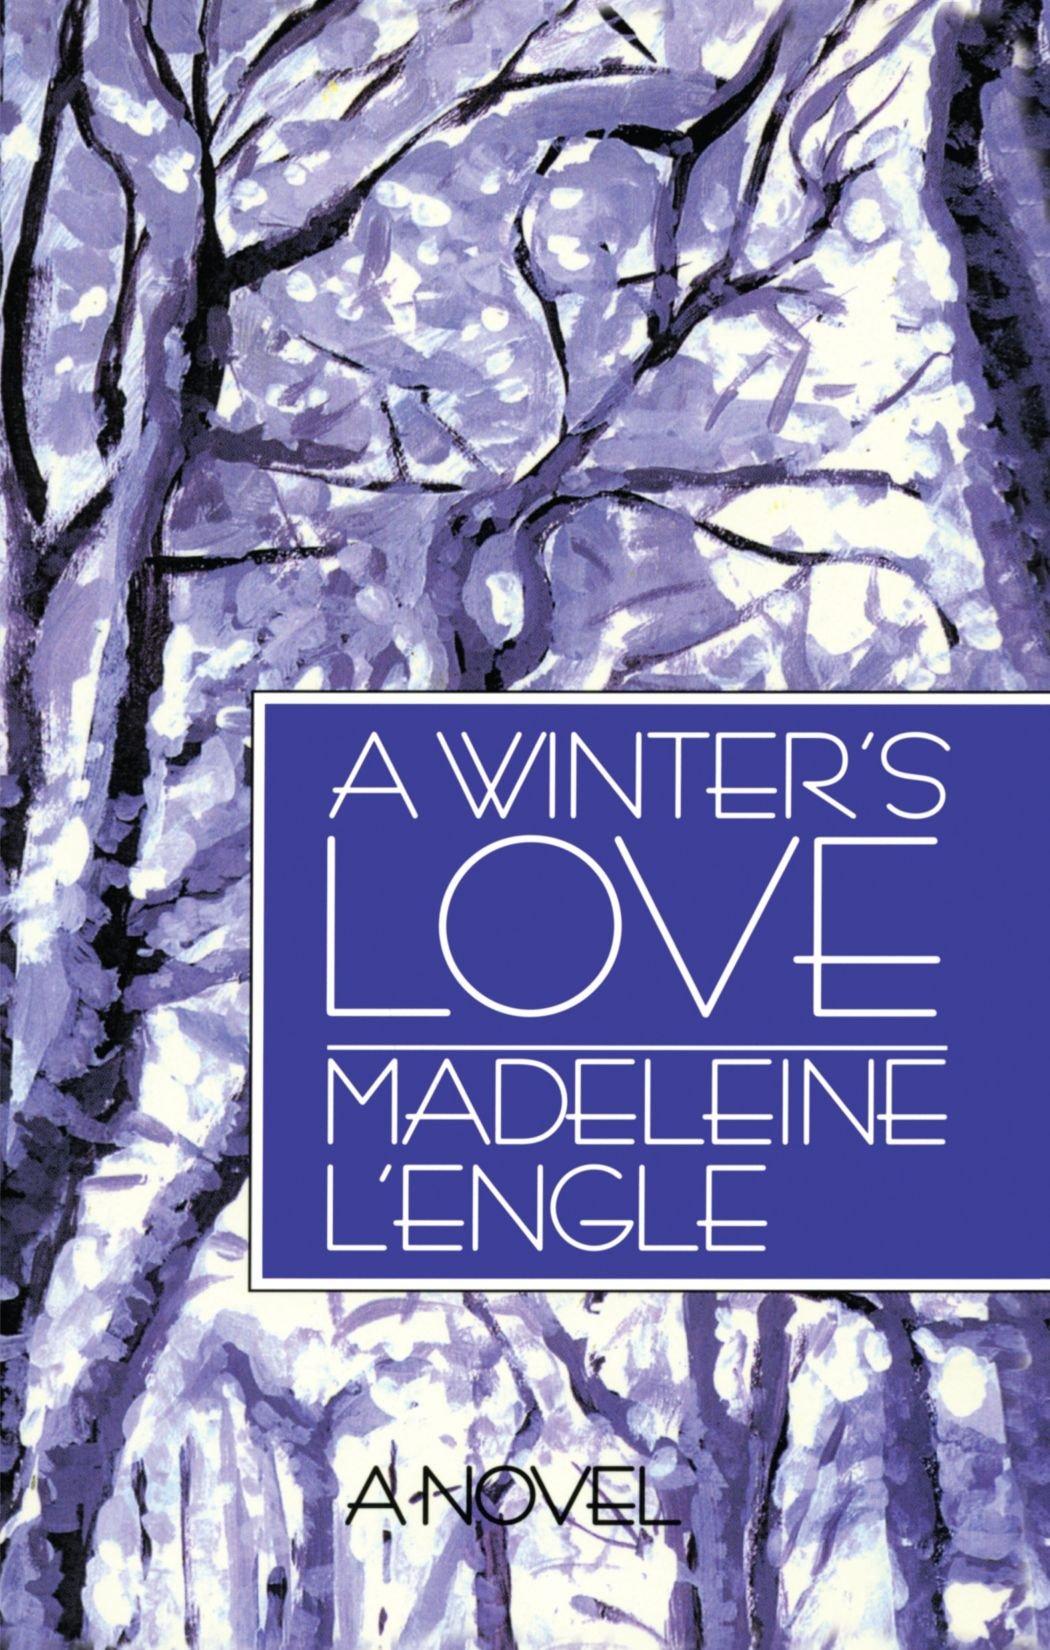 Amazon: A Winter's Love (wheaton Literary) (9780877888895): Madeleine  L'engle: Books